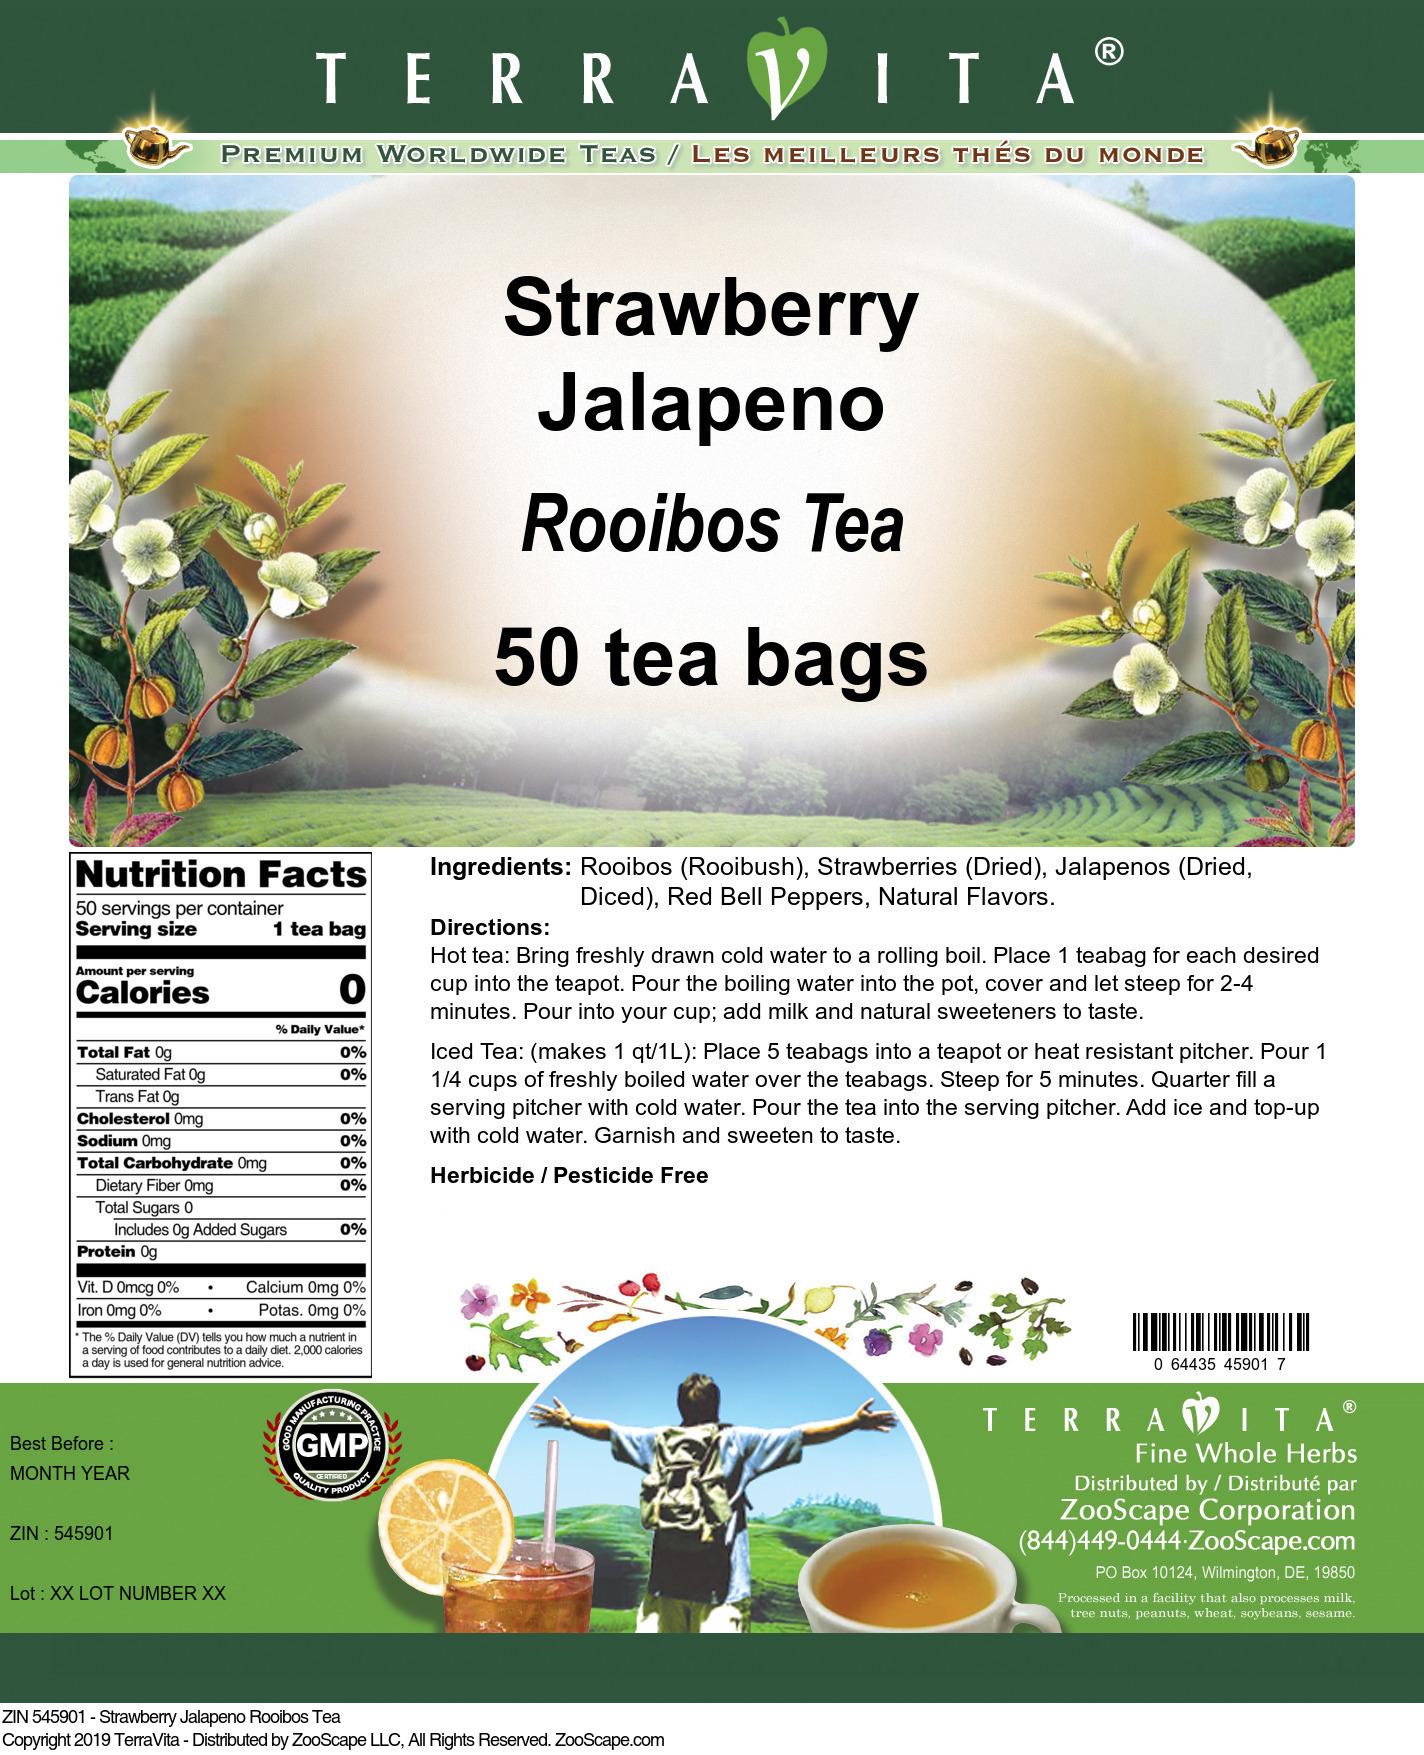 Strawberry Jalapeno Rooibos Tea